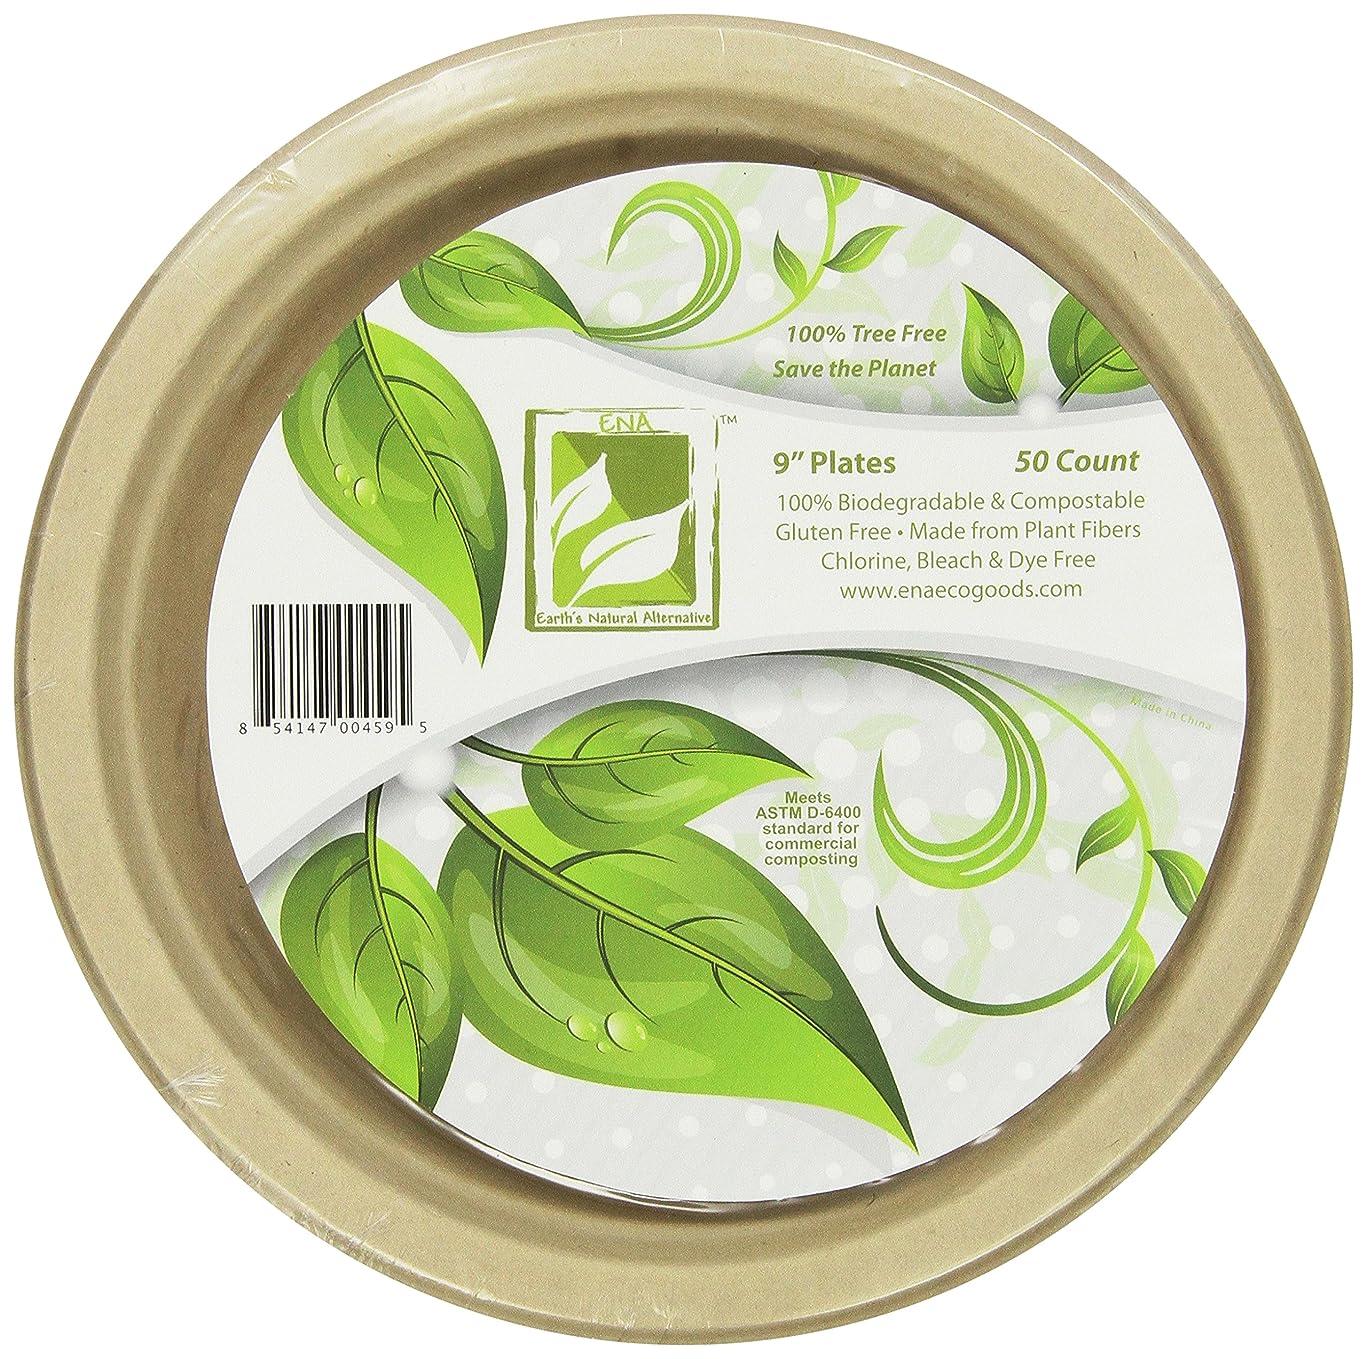 Earth's Natural Alternative Eco-Friendly, Natural Compostable Plant Fiber 9